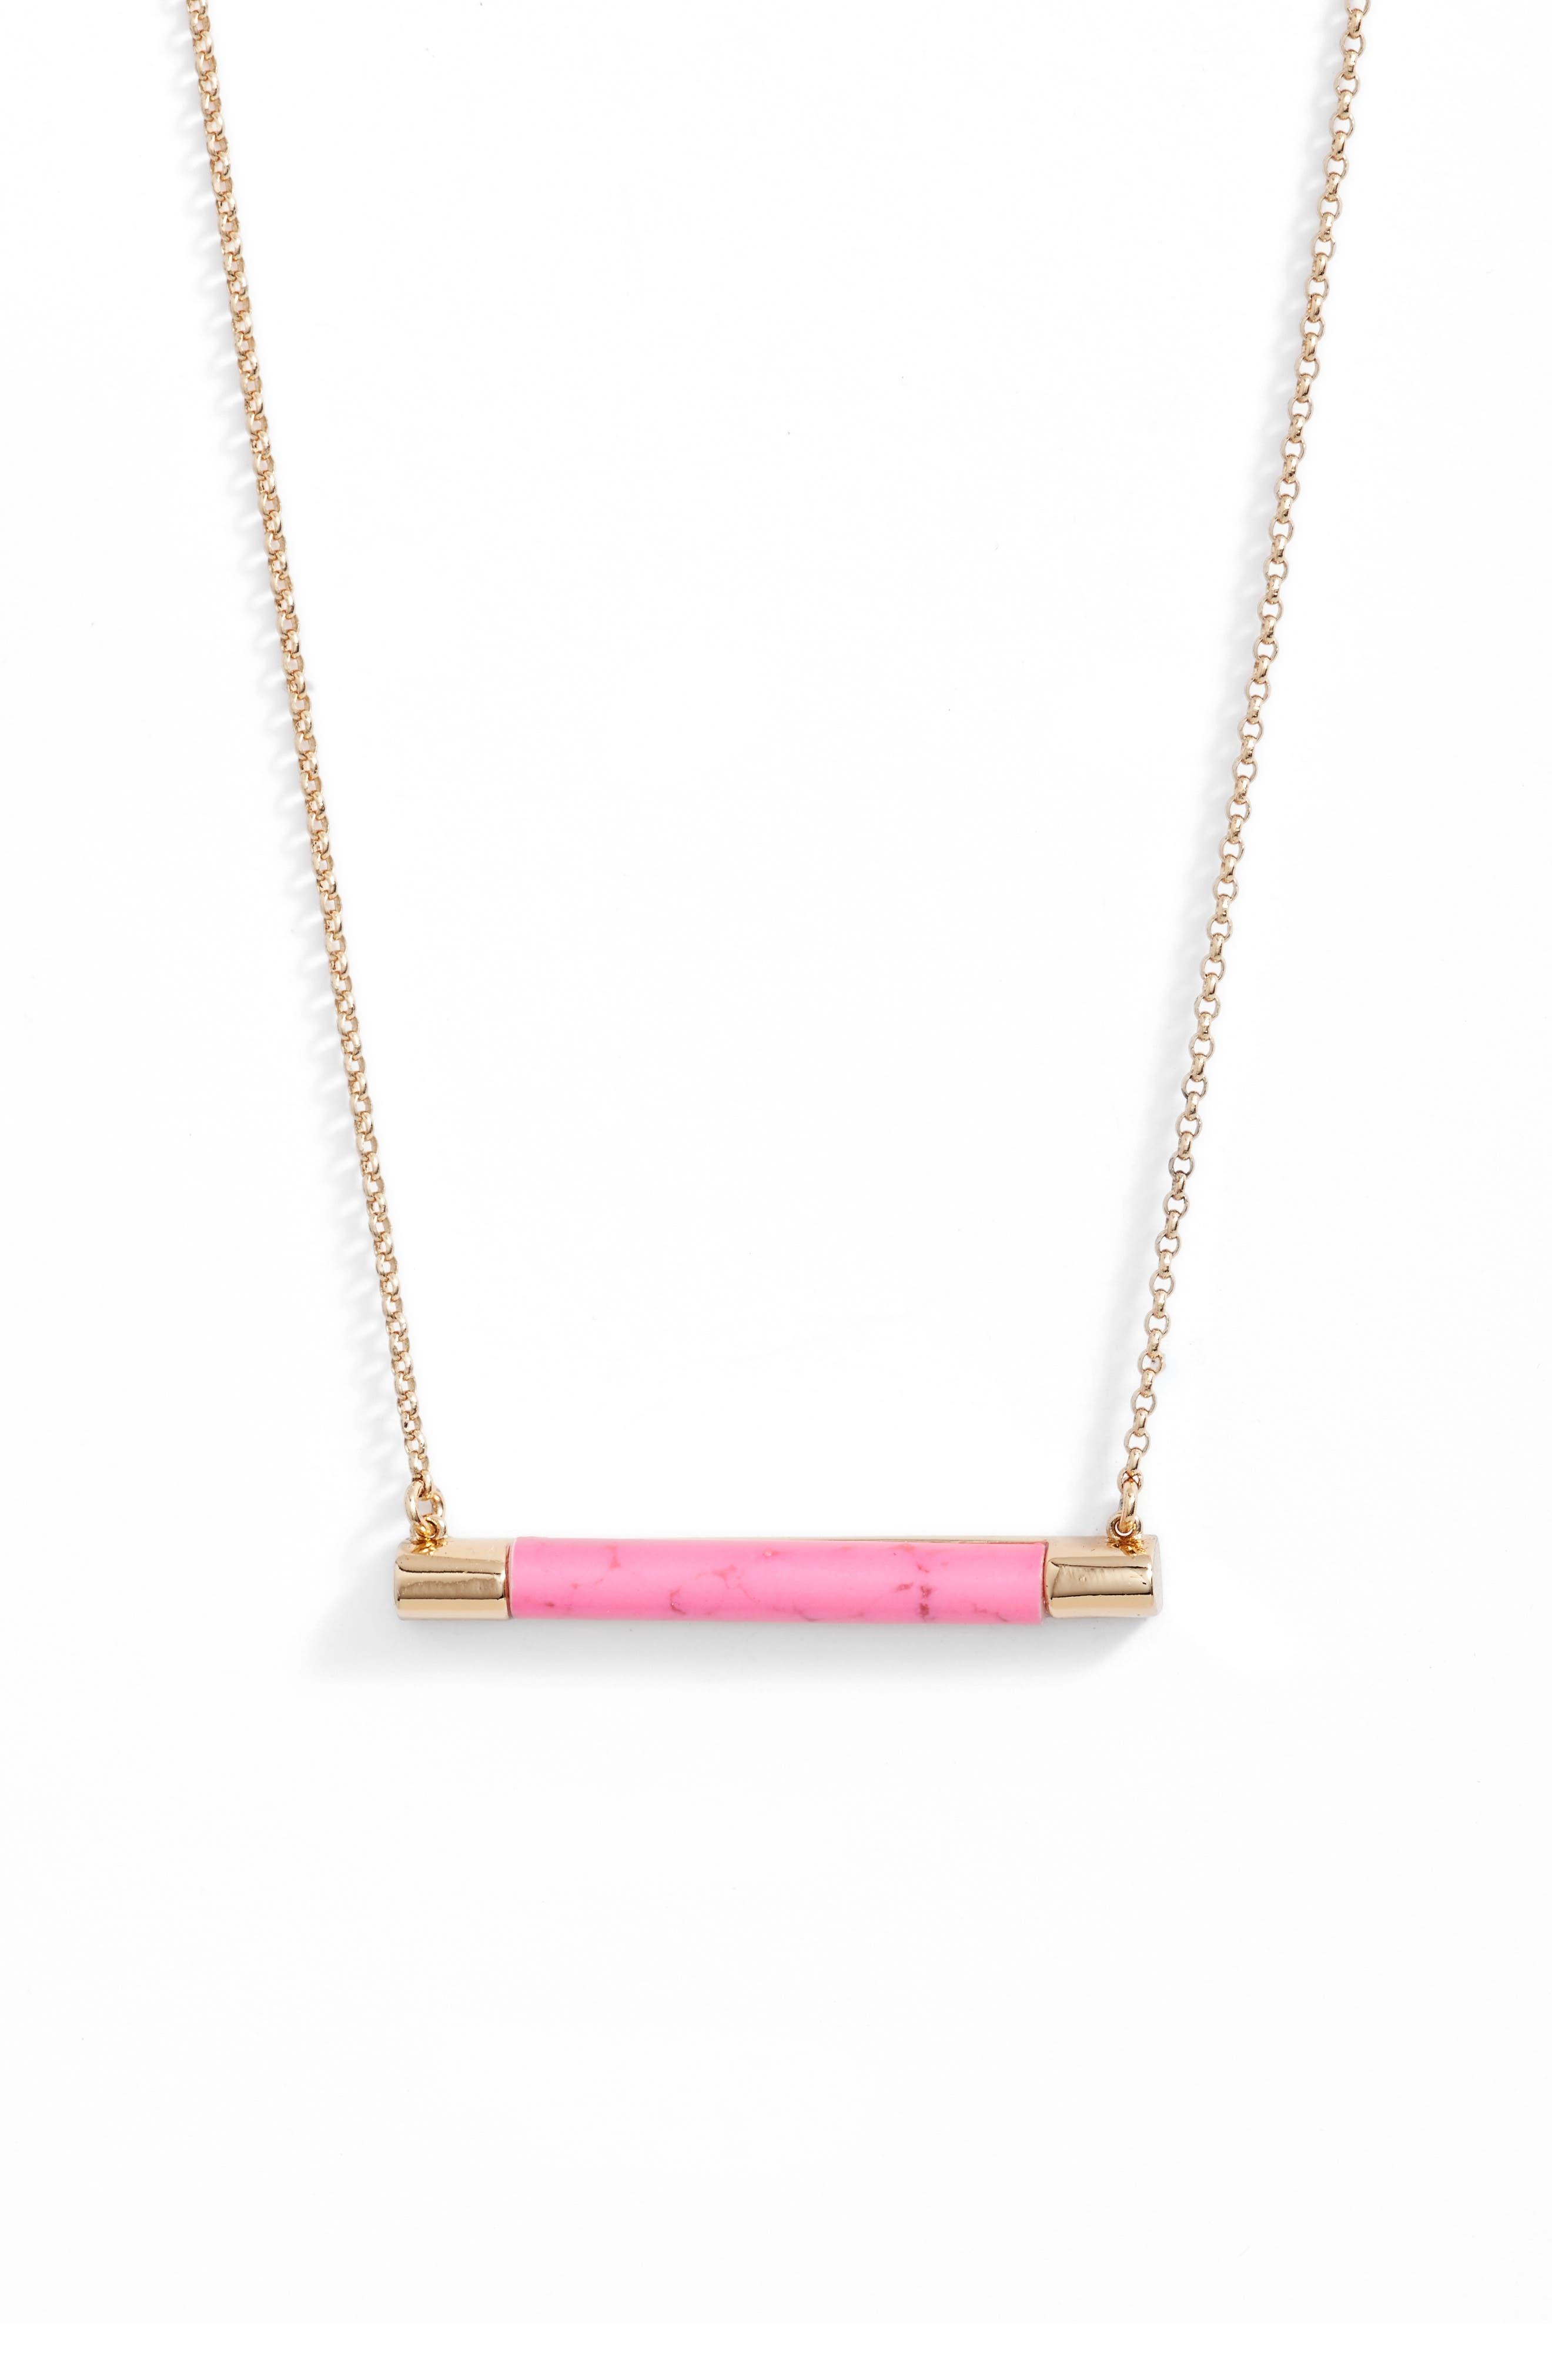 KATE SPADE NEW YORK building blocks bar pendant necklace